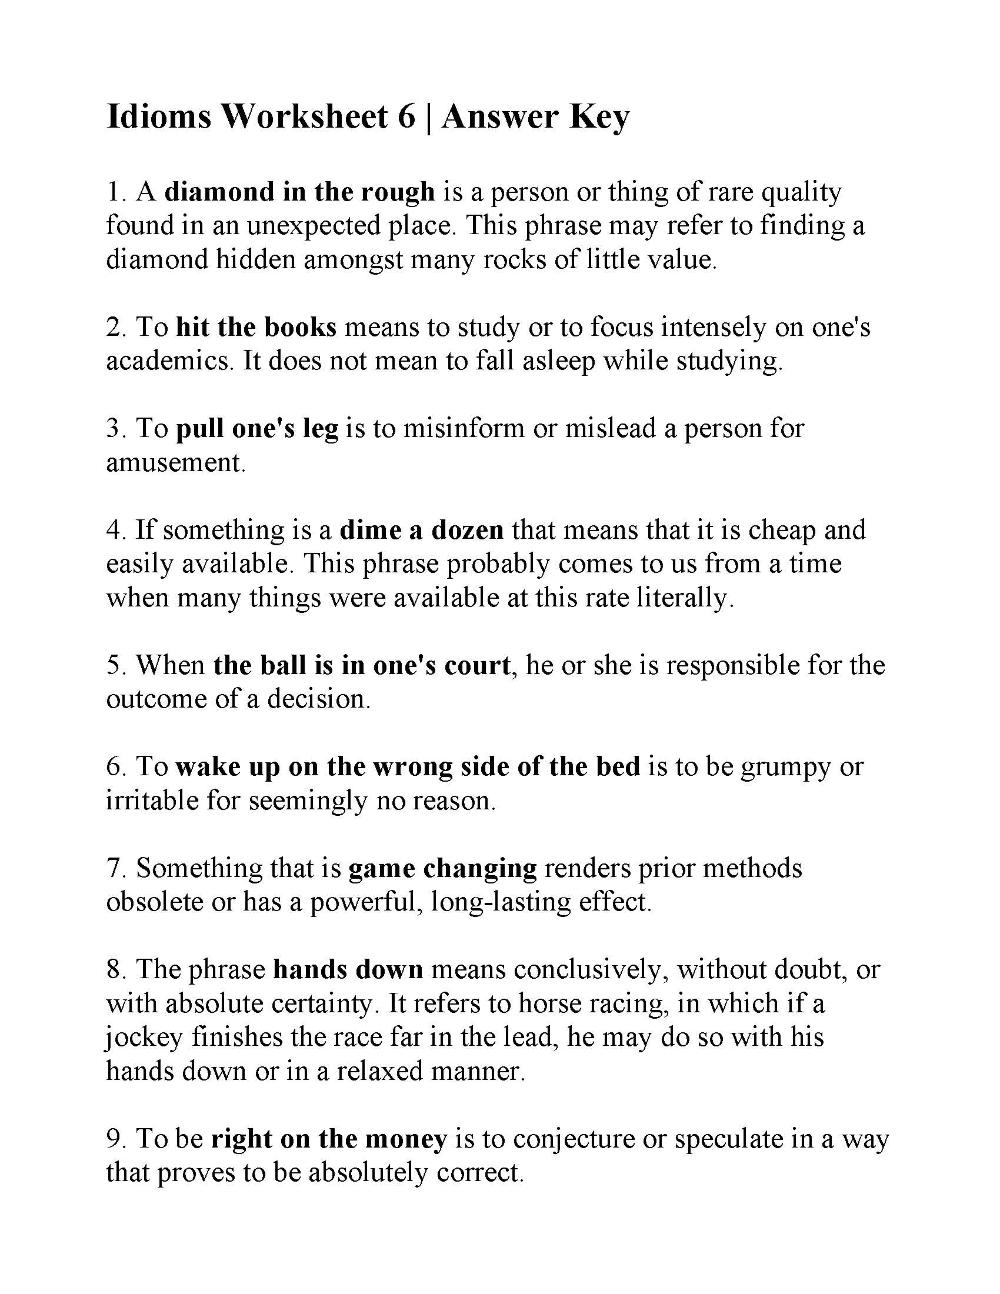 Idioms Worksheet 6 Answers Language Worksheets Worksheets For Kids Telling Time Worksheets [ 1294 x 1000 Pixel ]